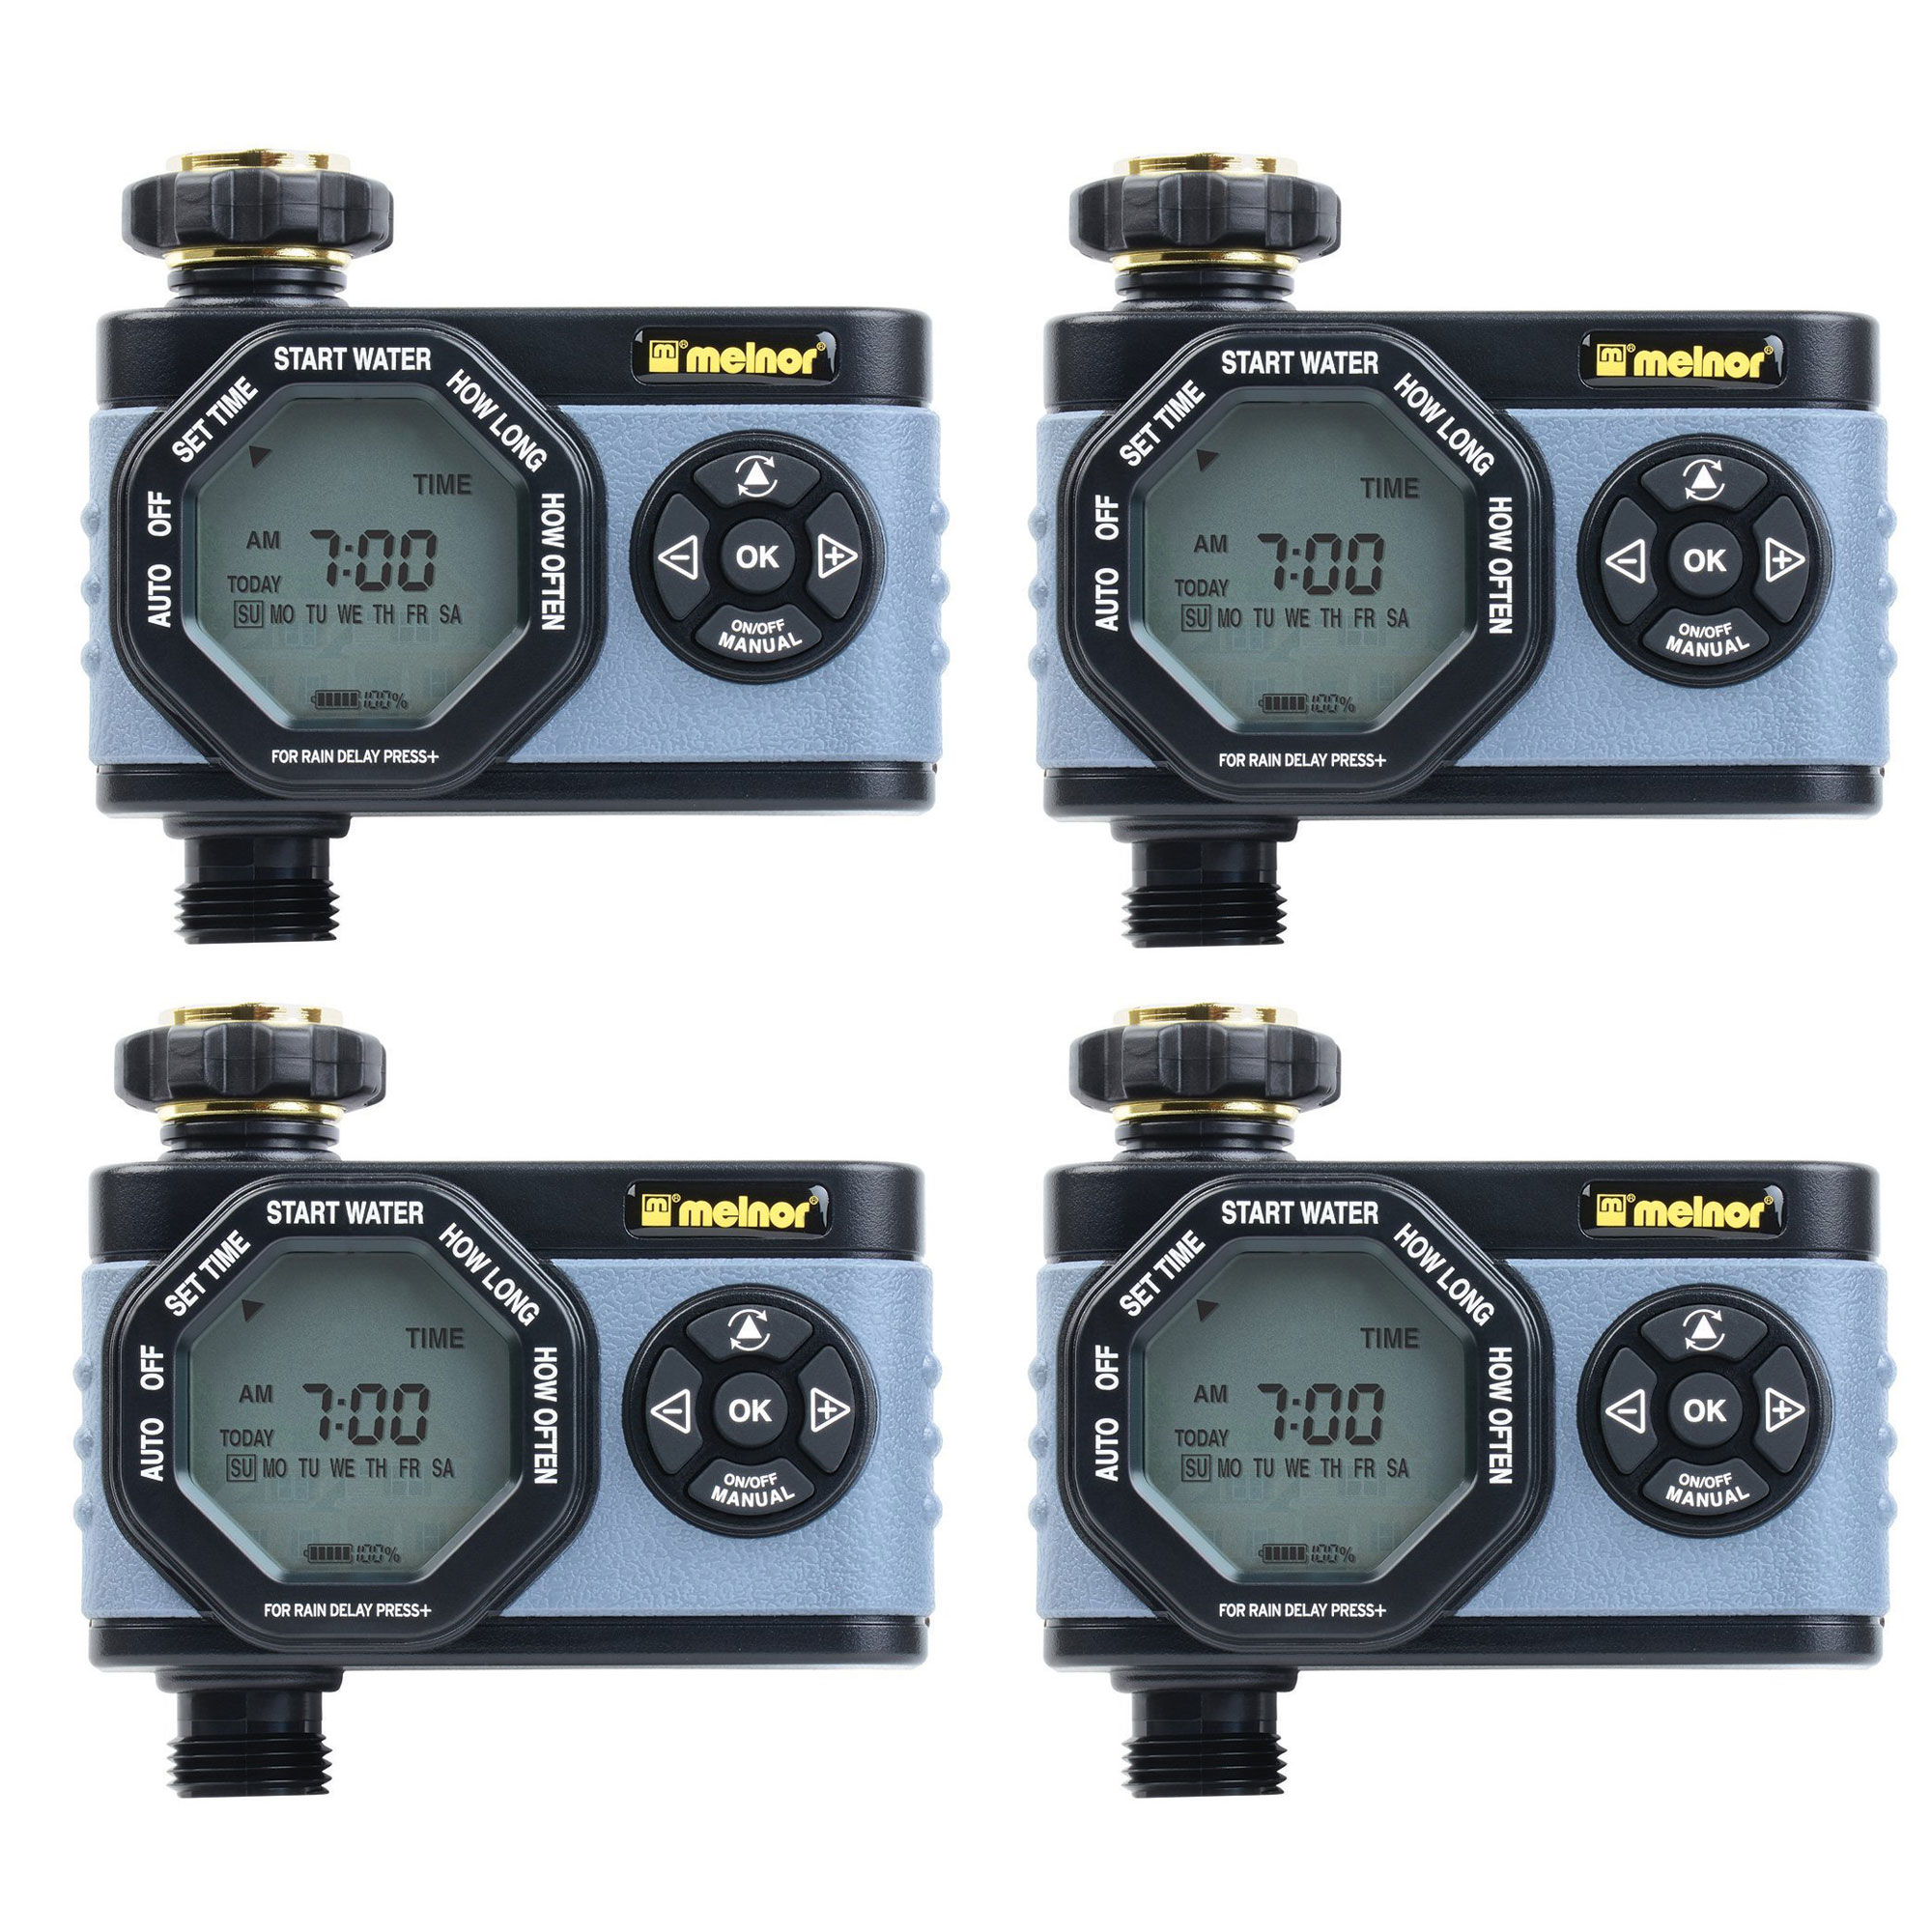 Melnor HydroLogic Digital Programmable Garden Water Timer & Controller (4 Pack)